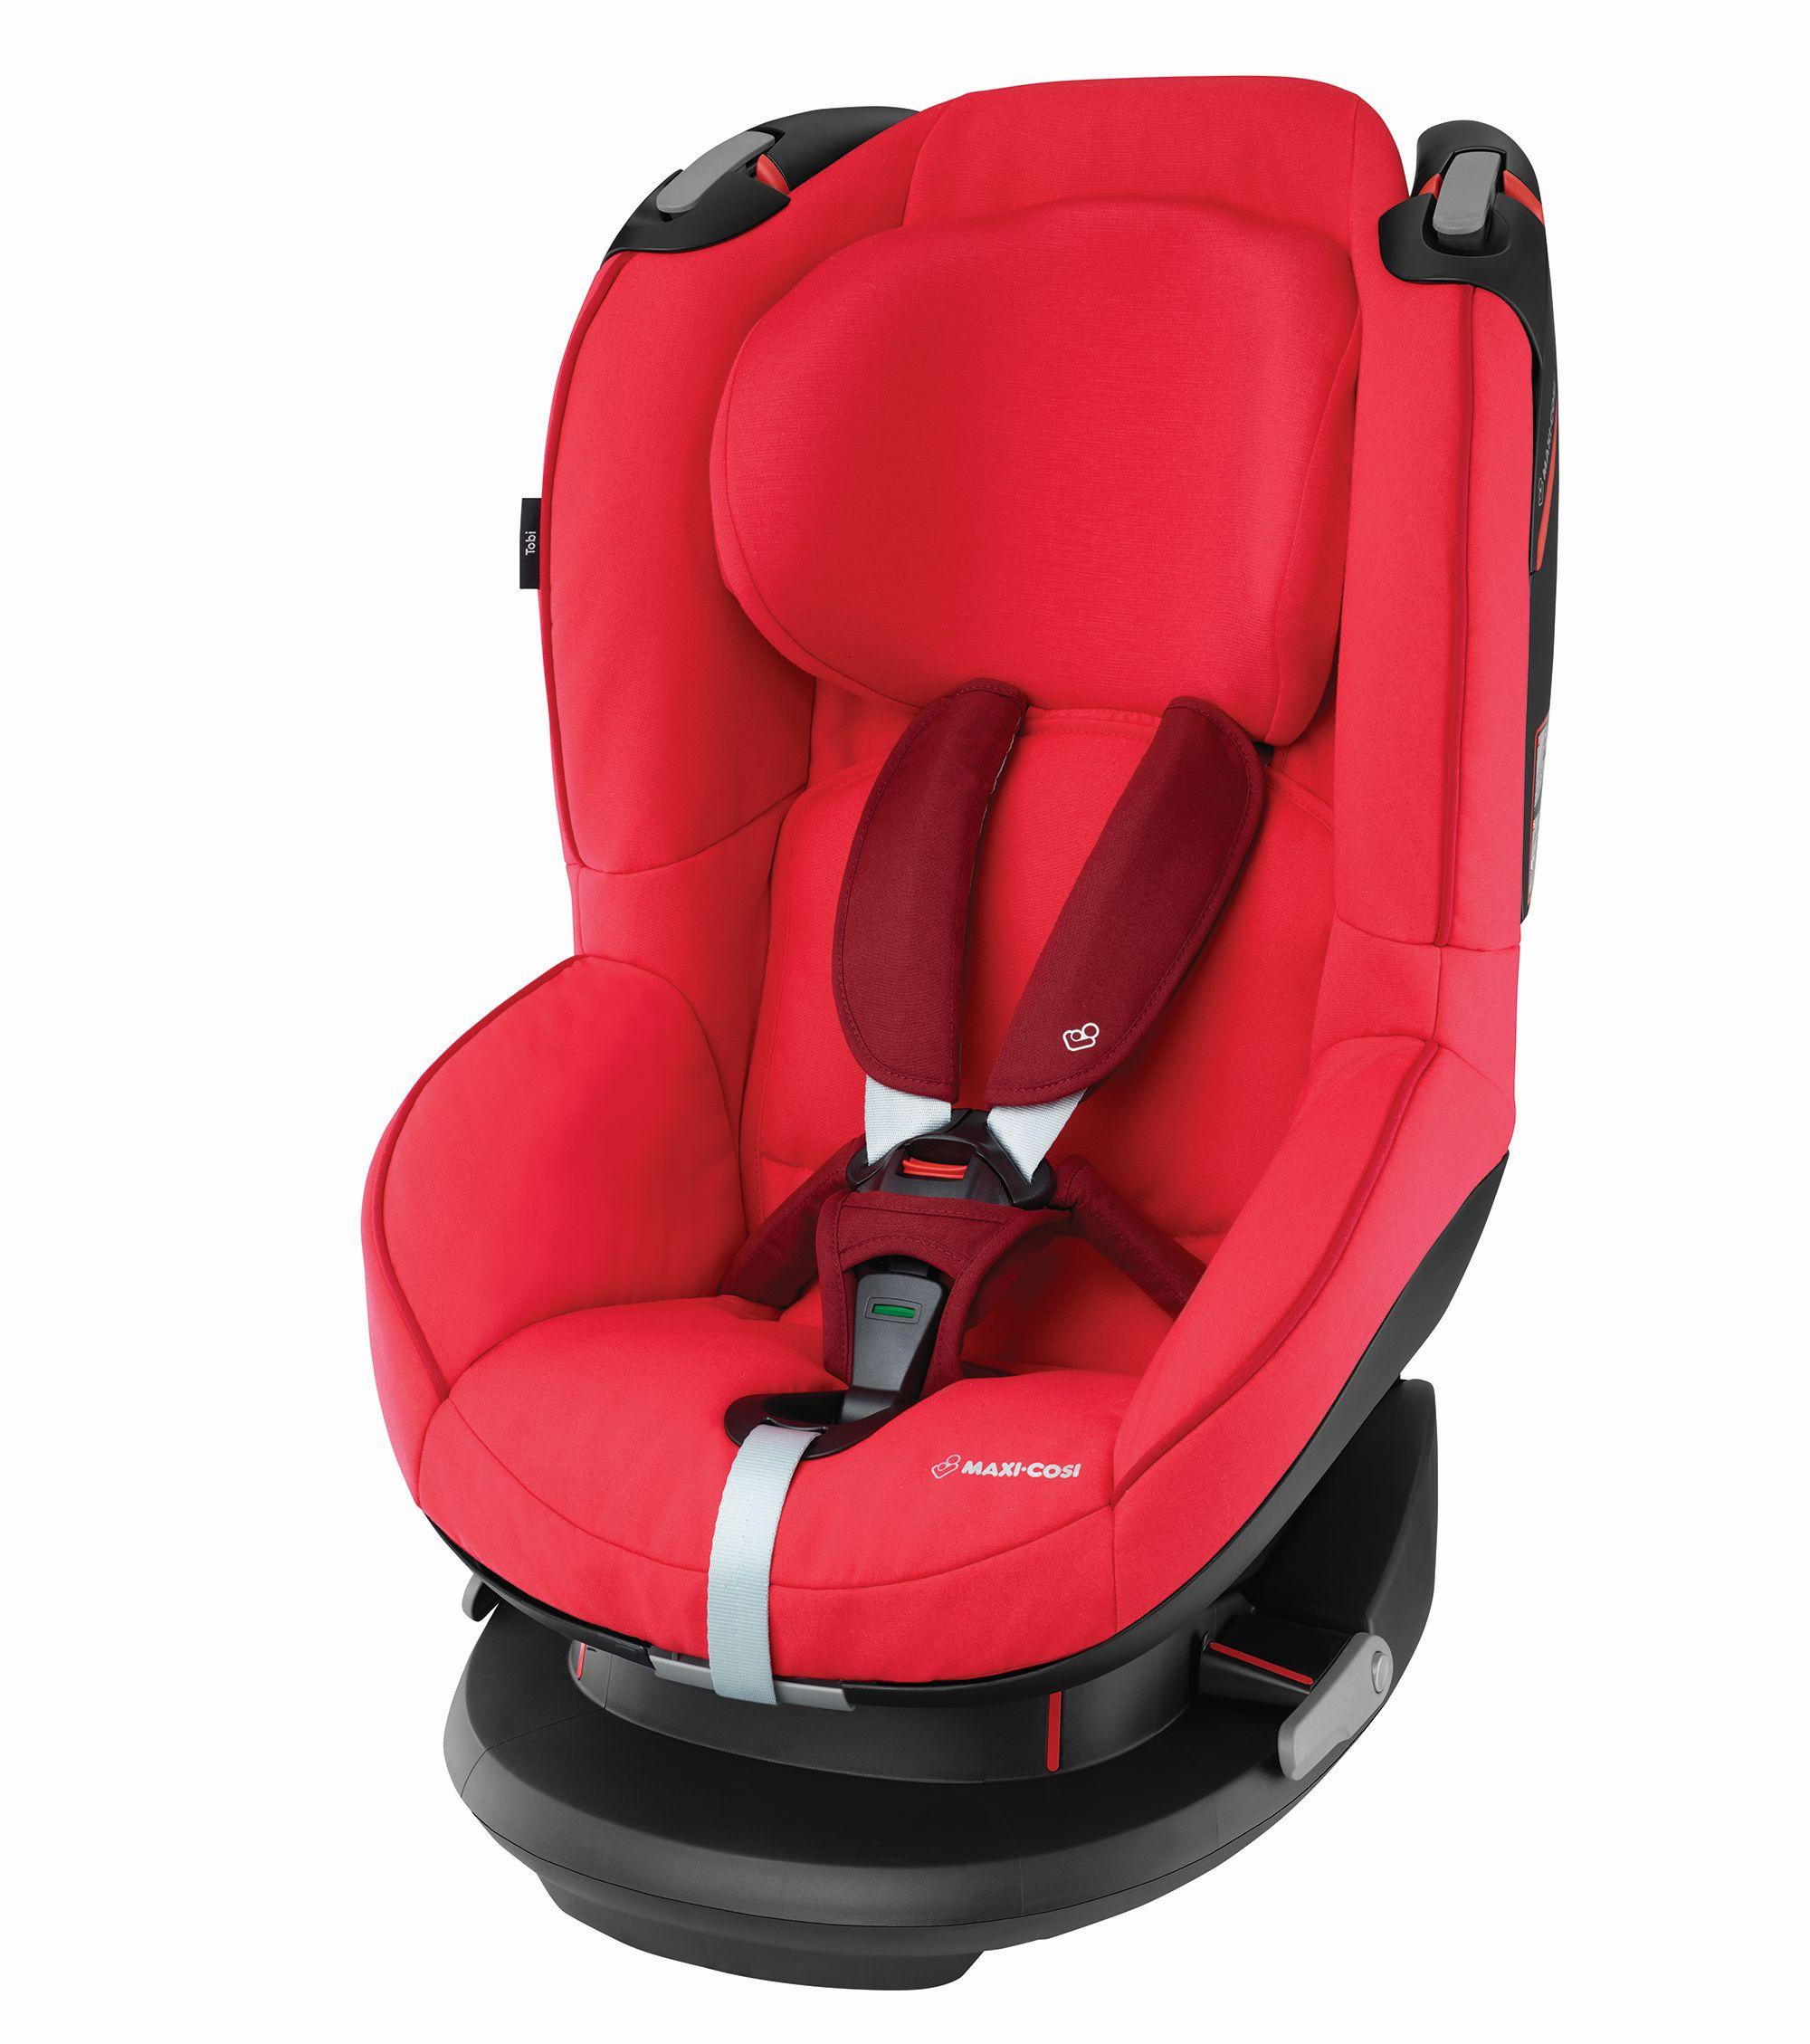 Bērnu autosēdeklis 9-18 kg MAXI-COSI Tobi Vivid Red